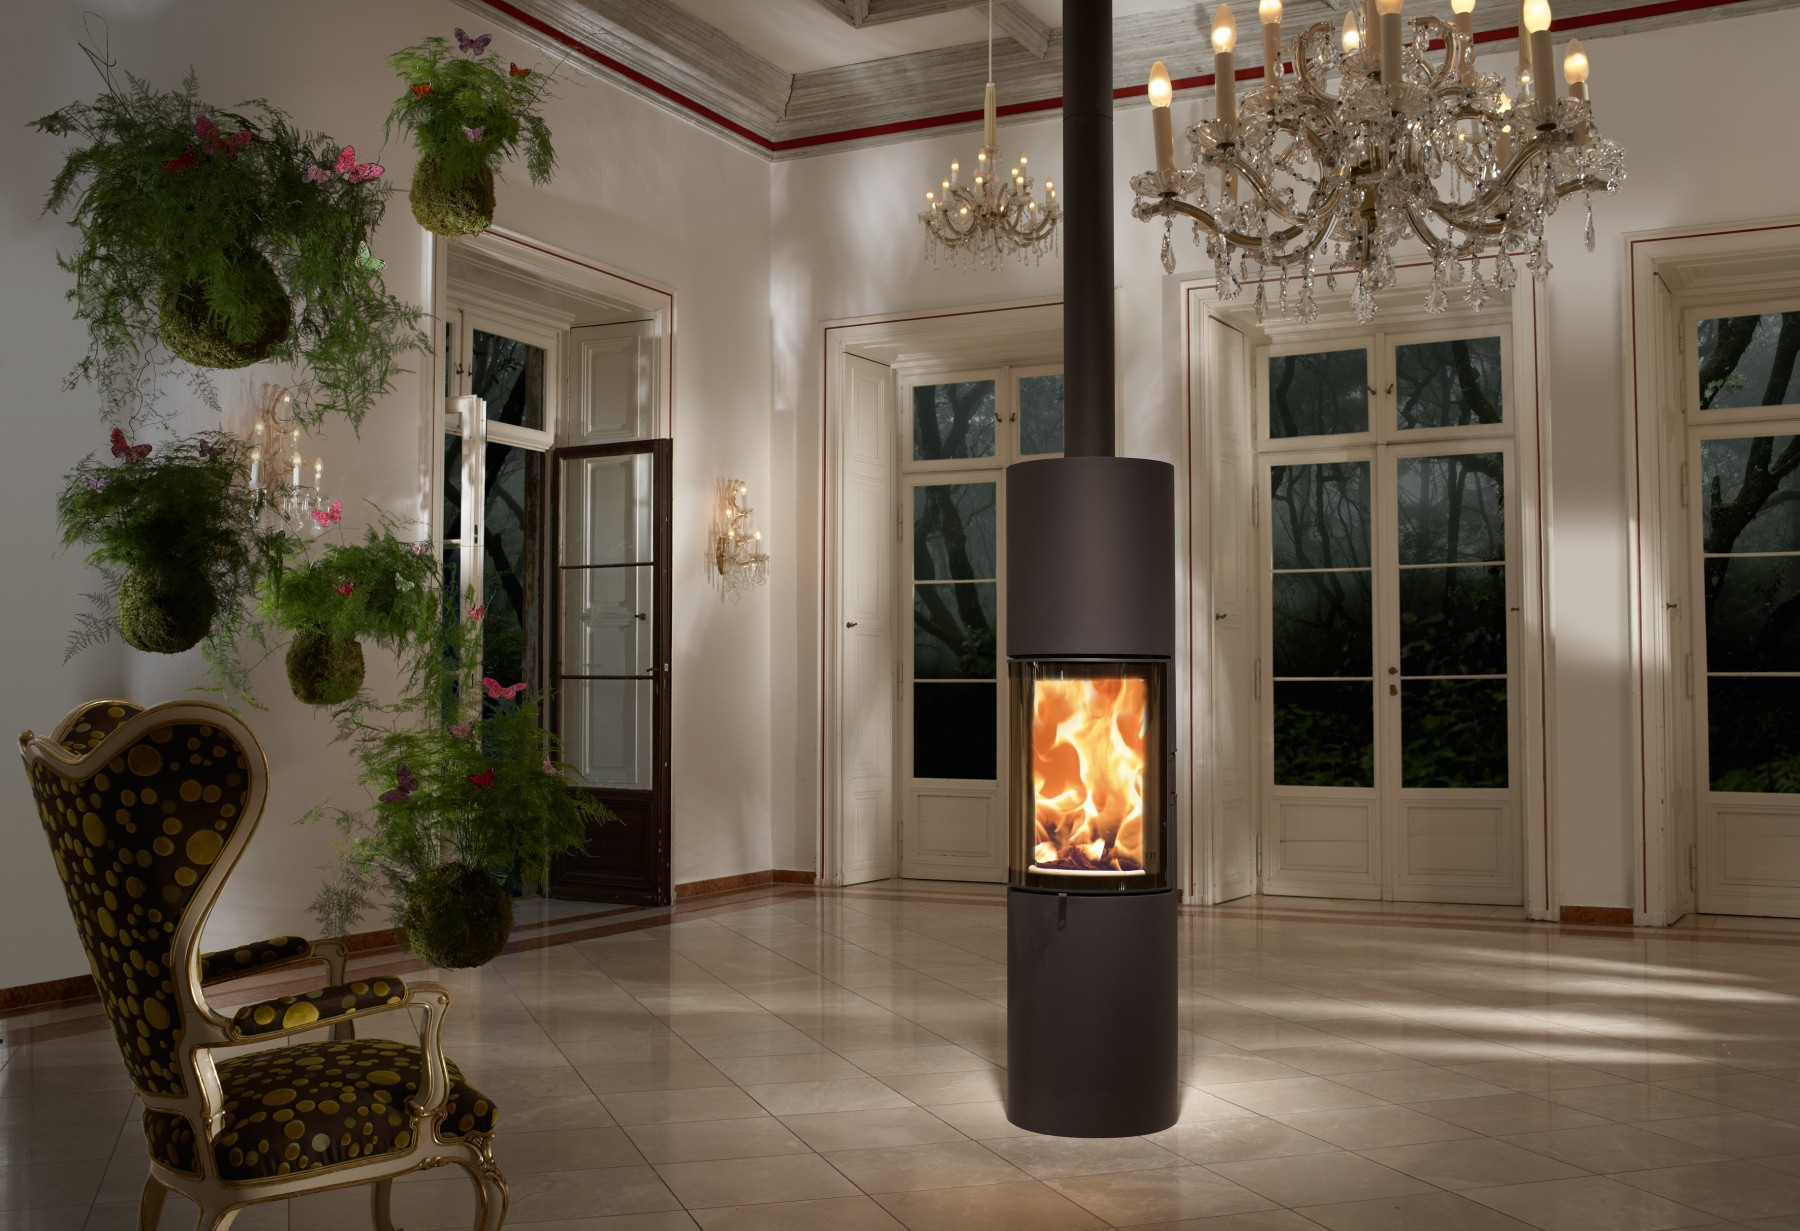 austroflamm slila kaminofen feuerland kiel. Black Bedroom Furniture Sets. Home Design Ideas